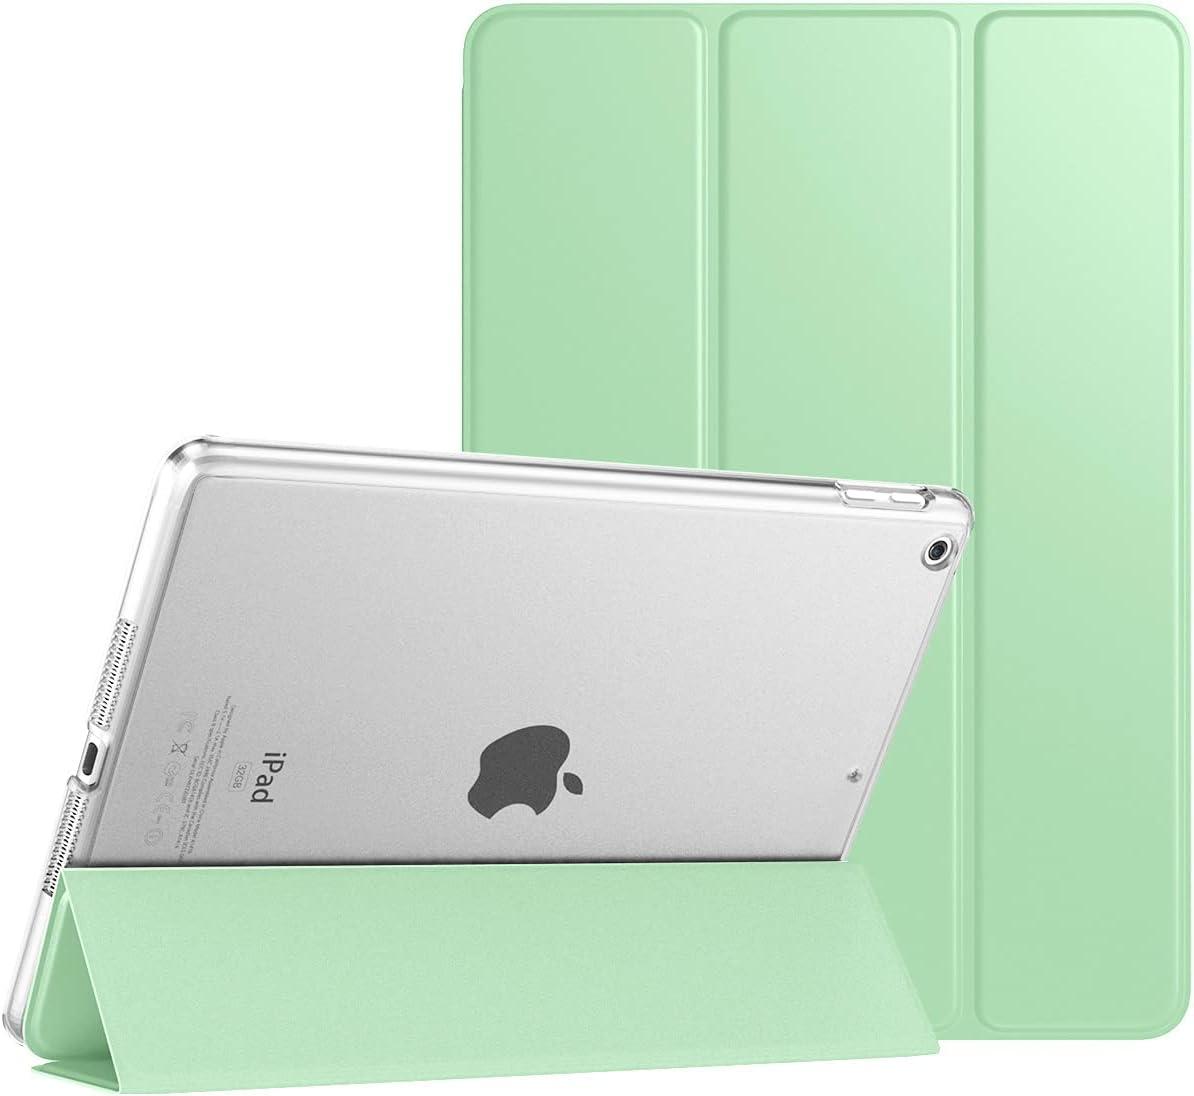 TiMOVO Case for New iPad 8th Generation 2020 / iPad 7th Generation 10.2